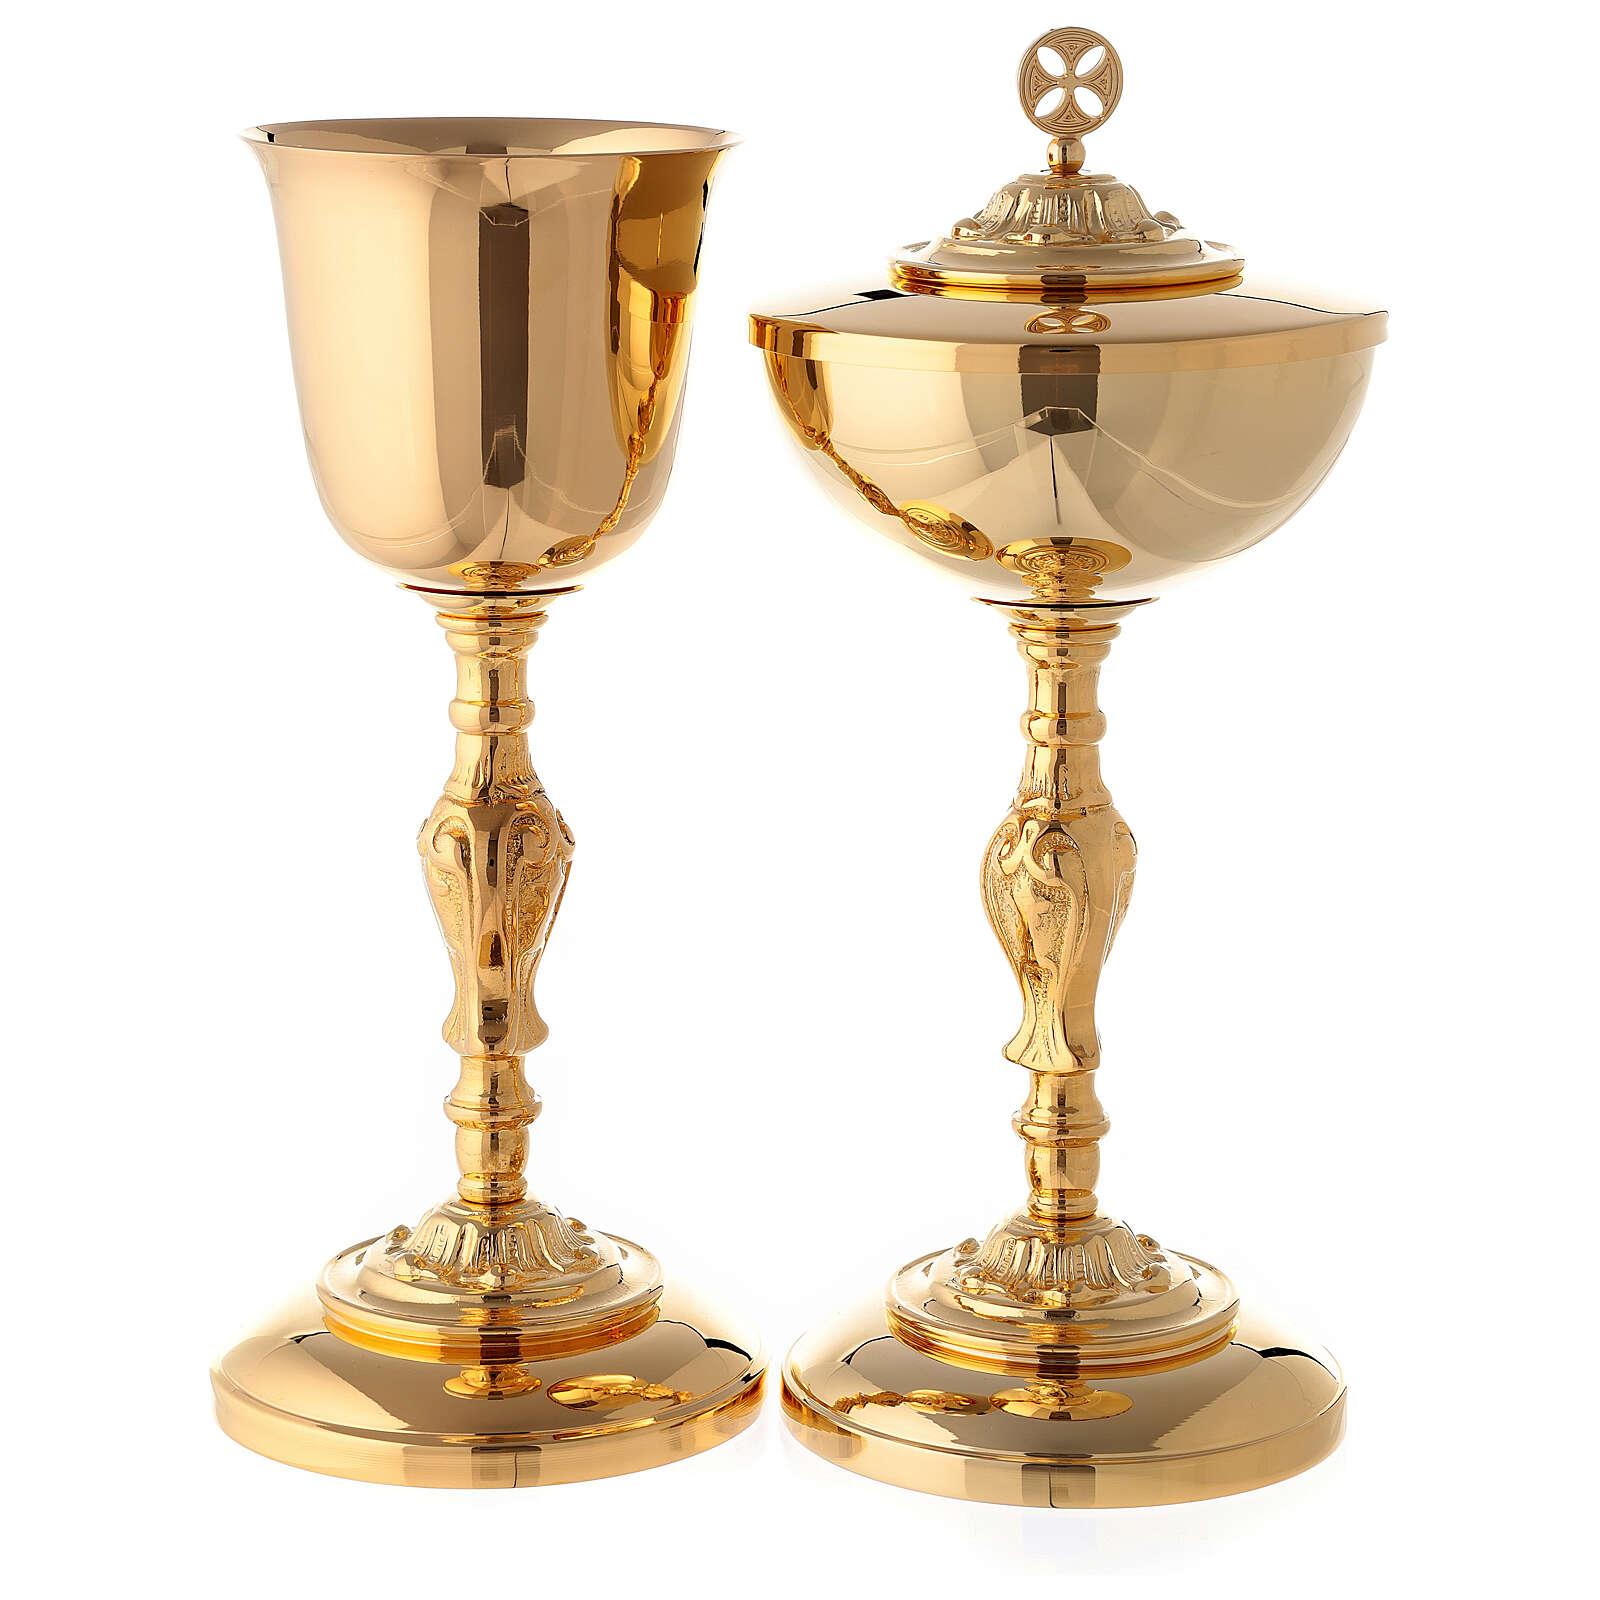 Baroque chalice and ciborium in 24-karat gold plated brass 4